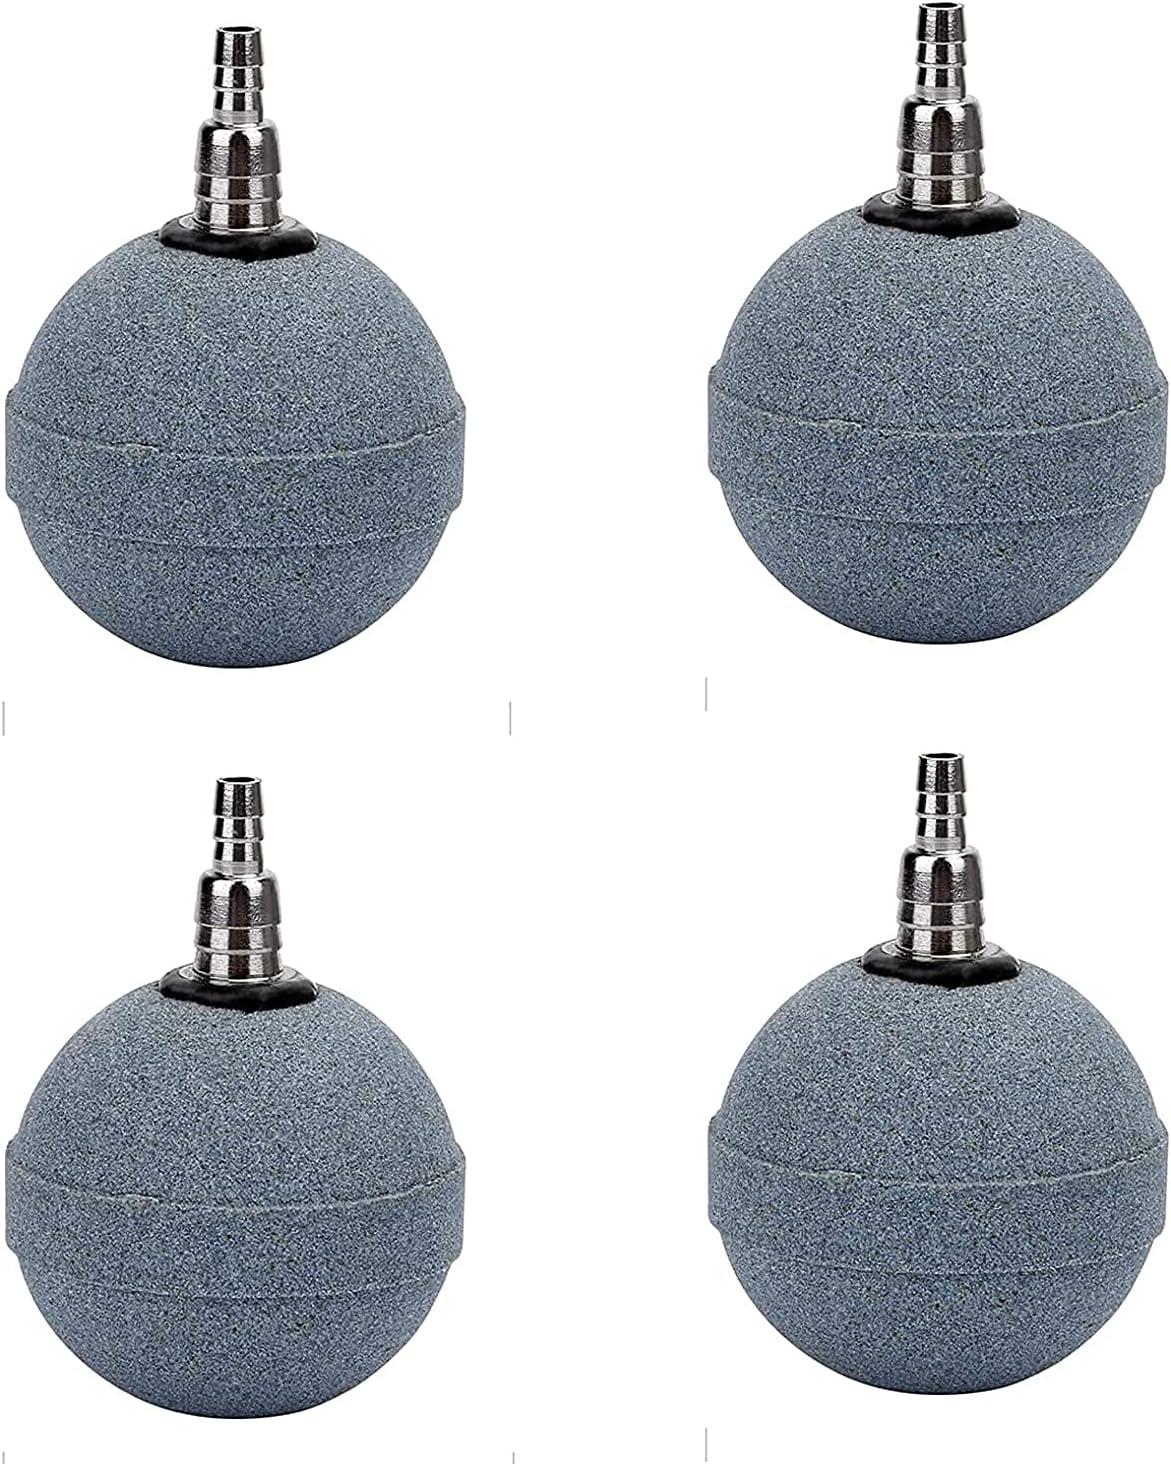 4Pcs 2 Inch Crazy Air Stone List specialty shop price Bubble Aerator Pump Diffuser Ac